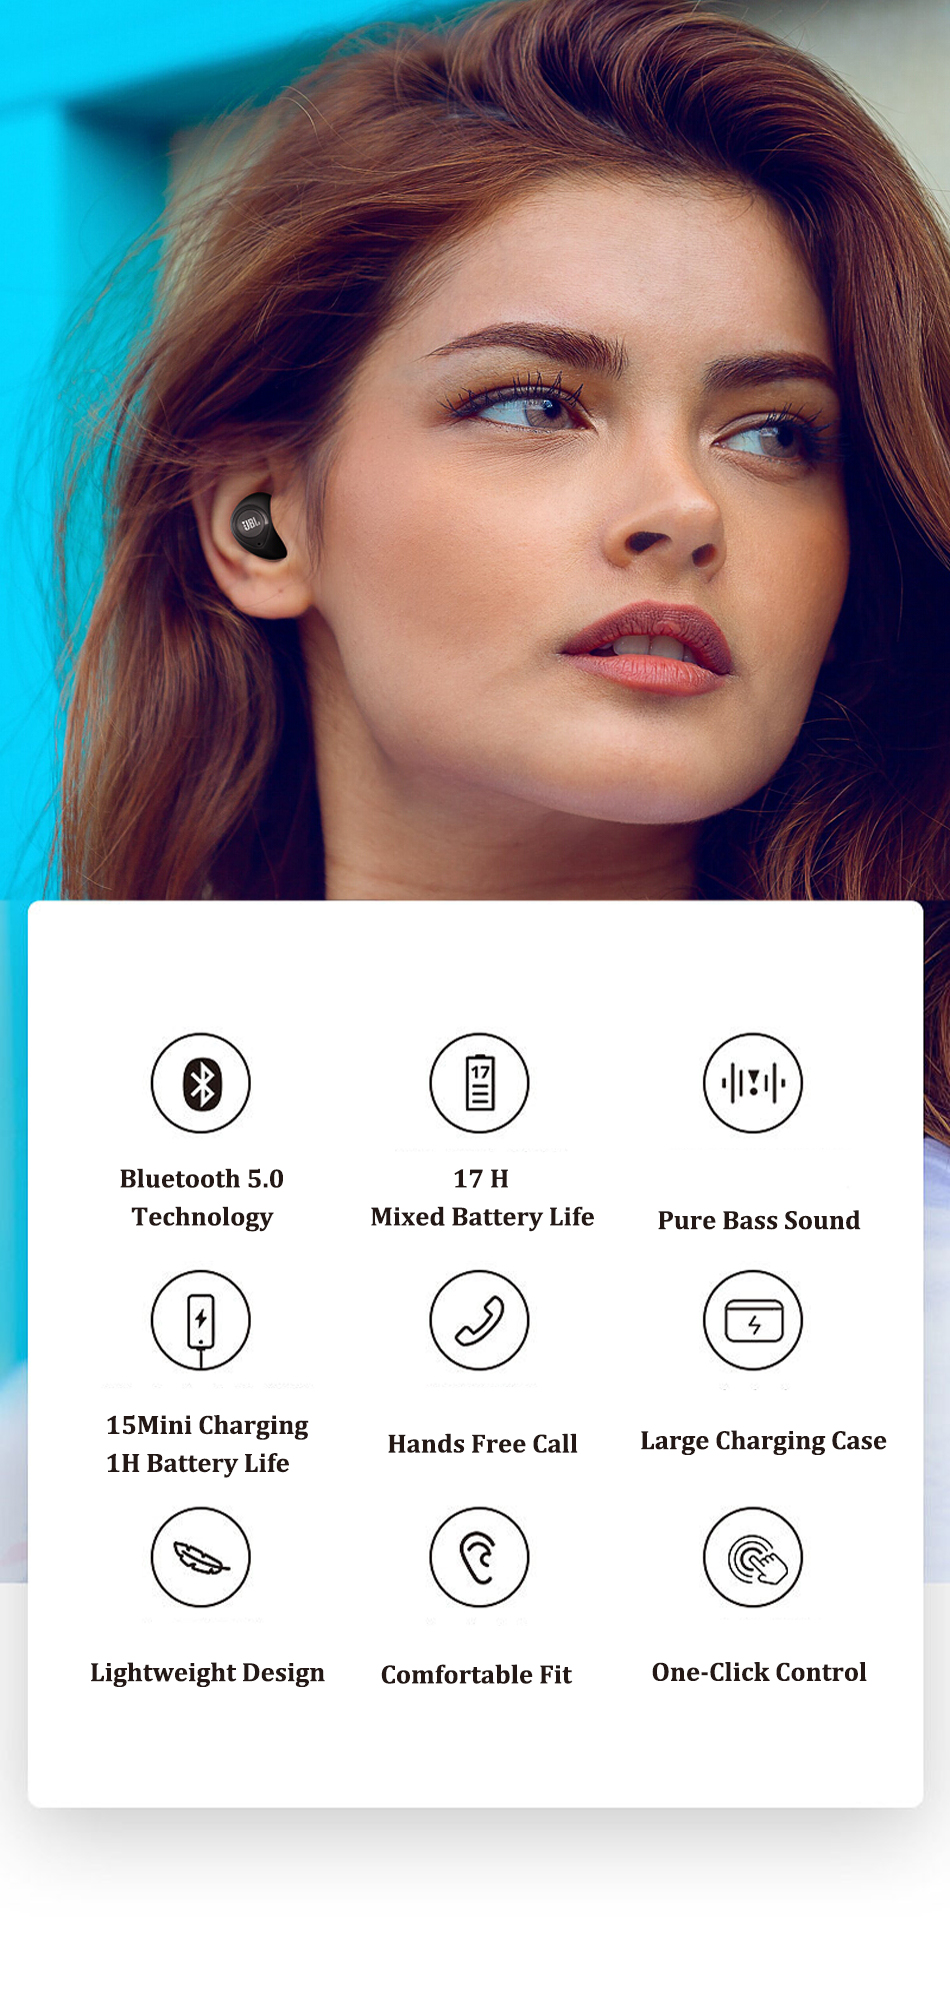 JBL C100TWS True wireless headphones 6